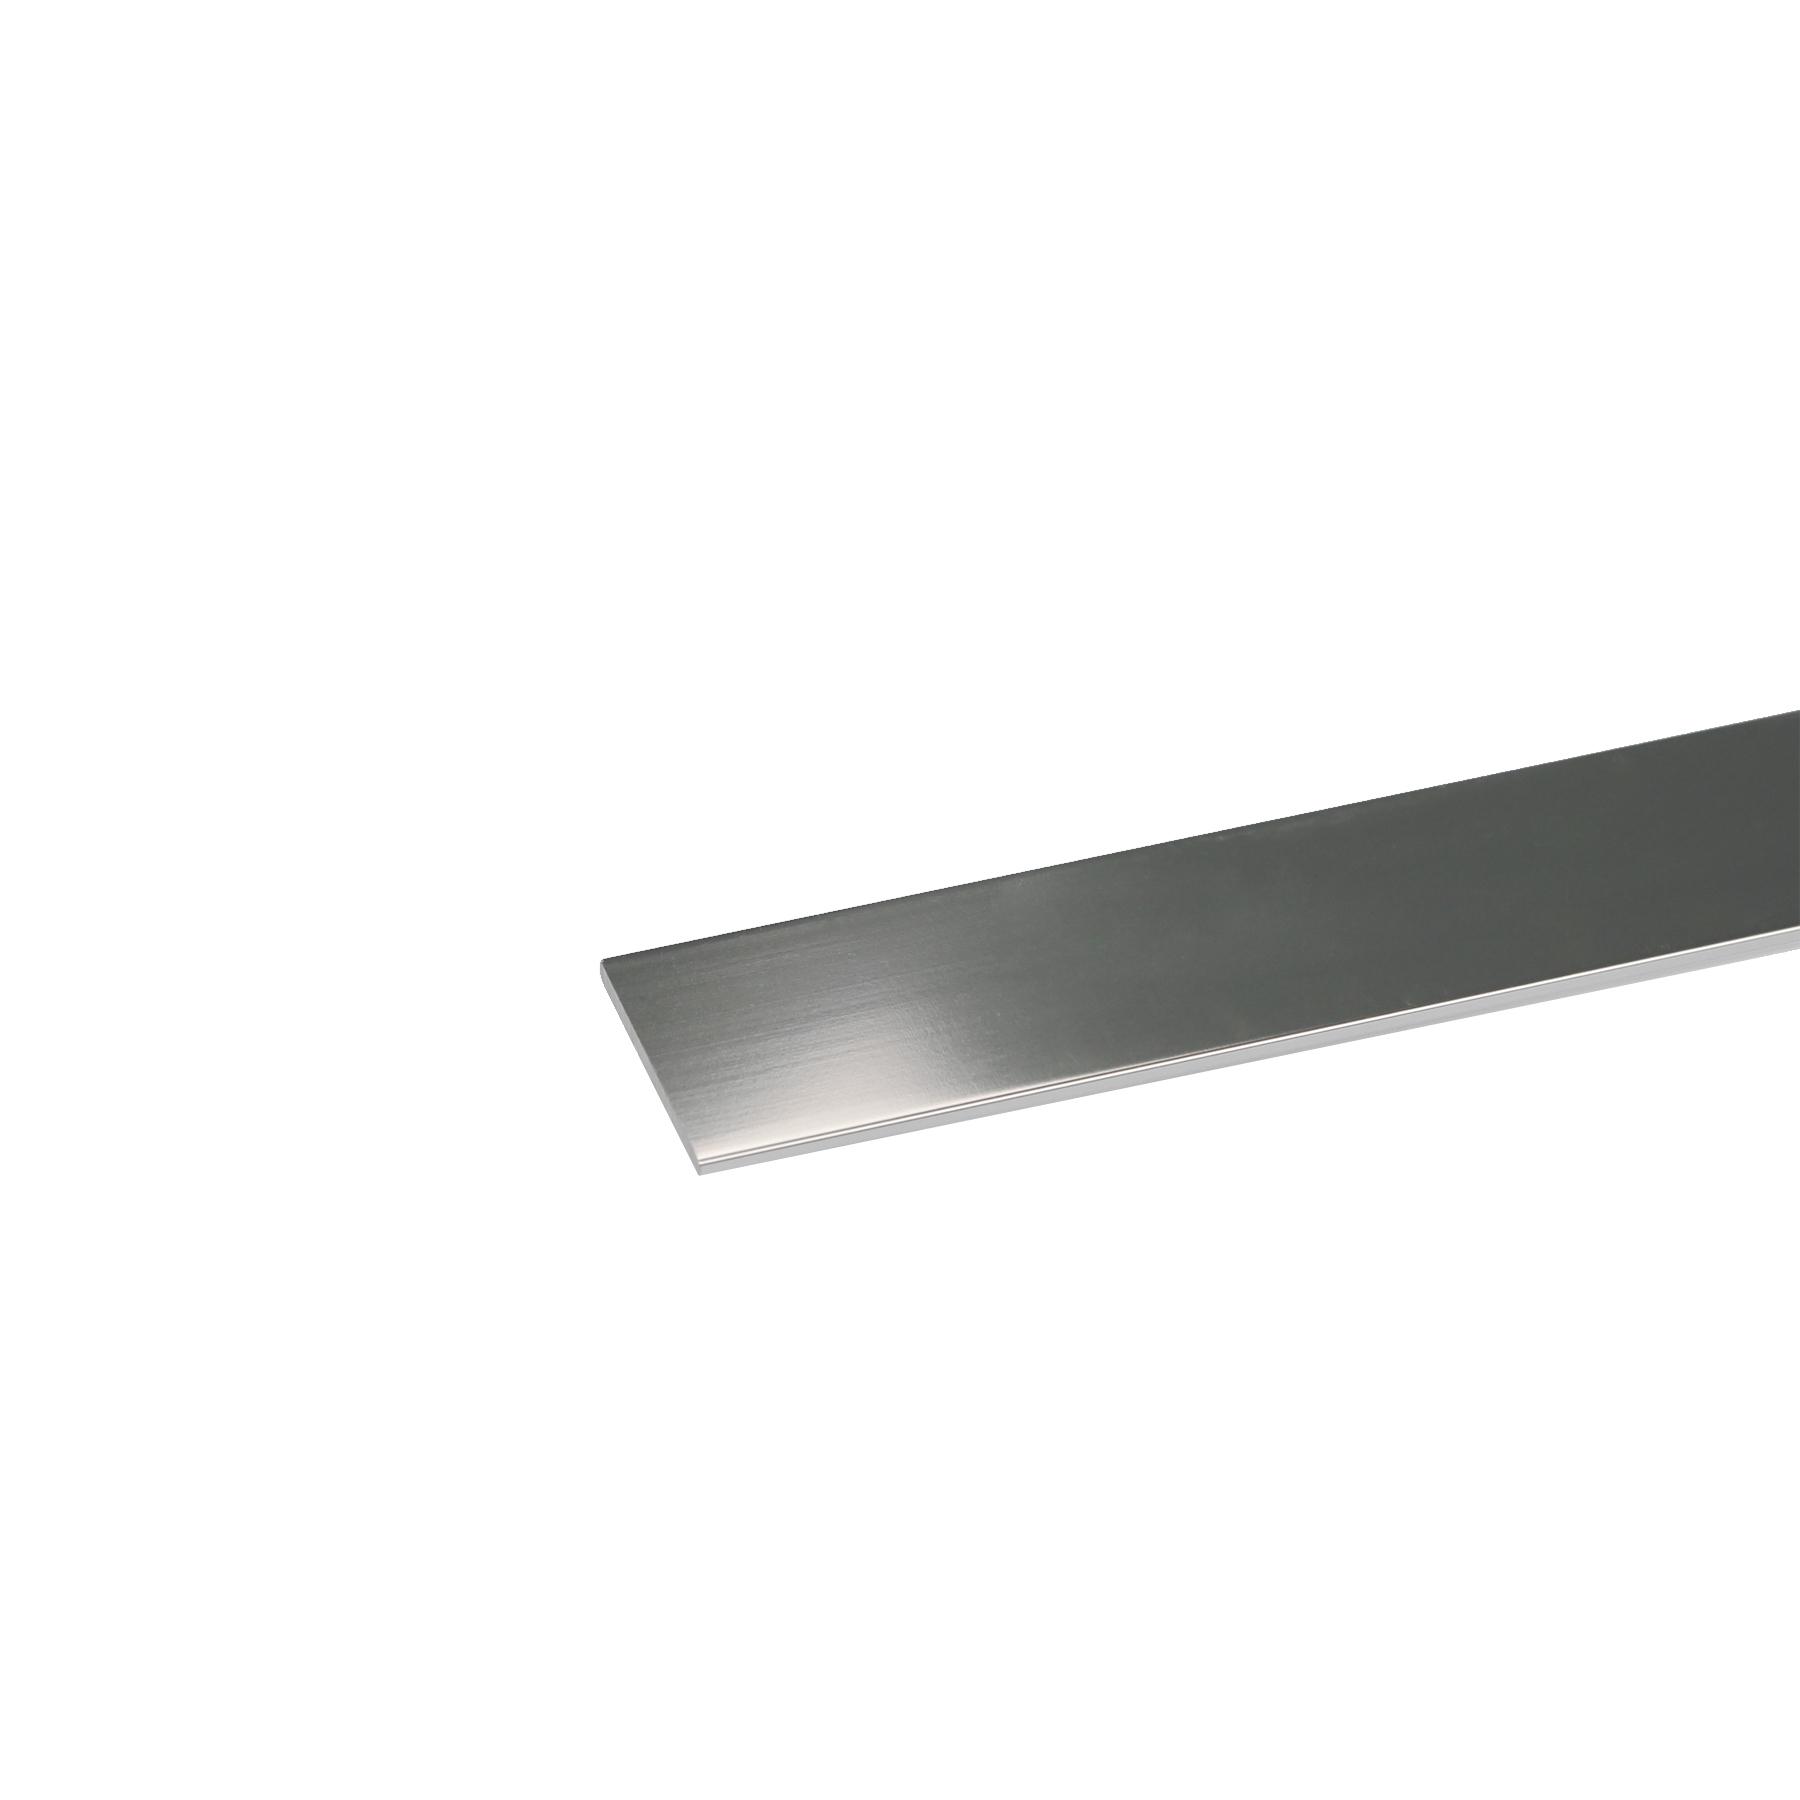 Perfil alum nio plano 1mx30x2mm brilhante leroy merlin for Perfil u aluminio leroy merlin